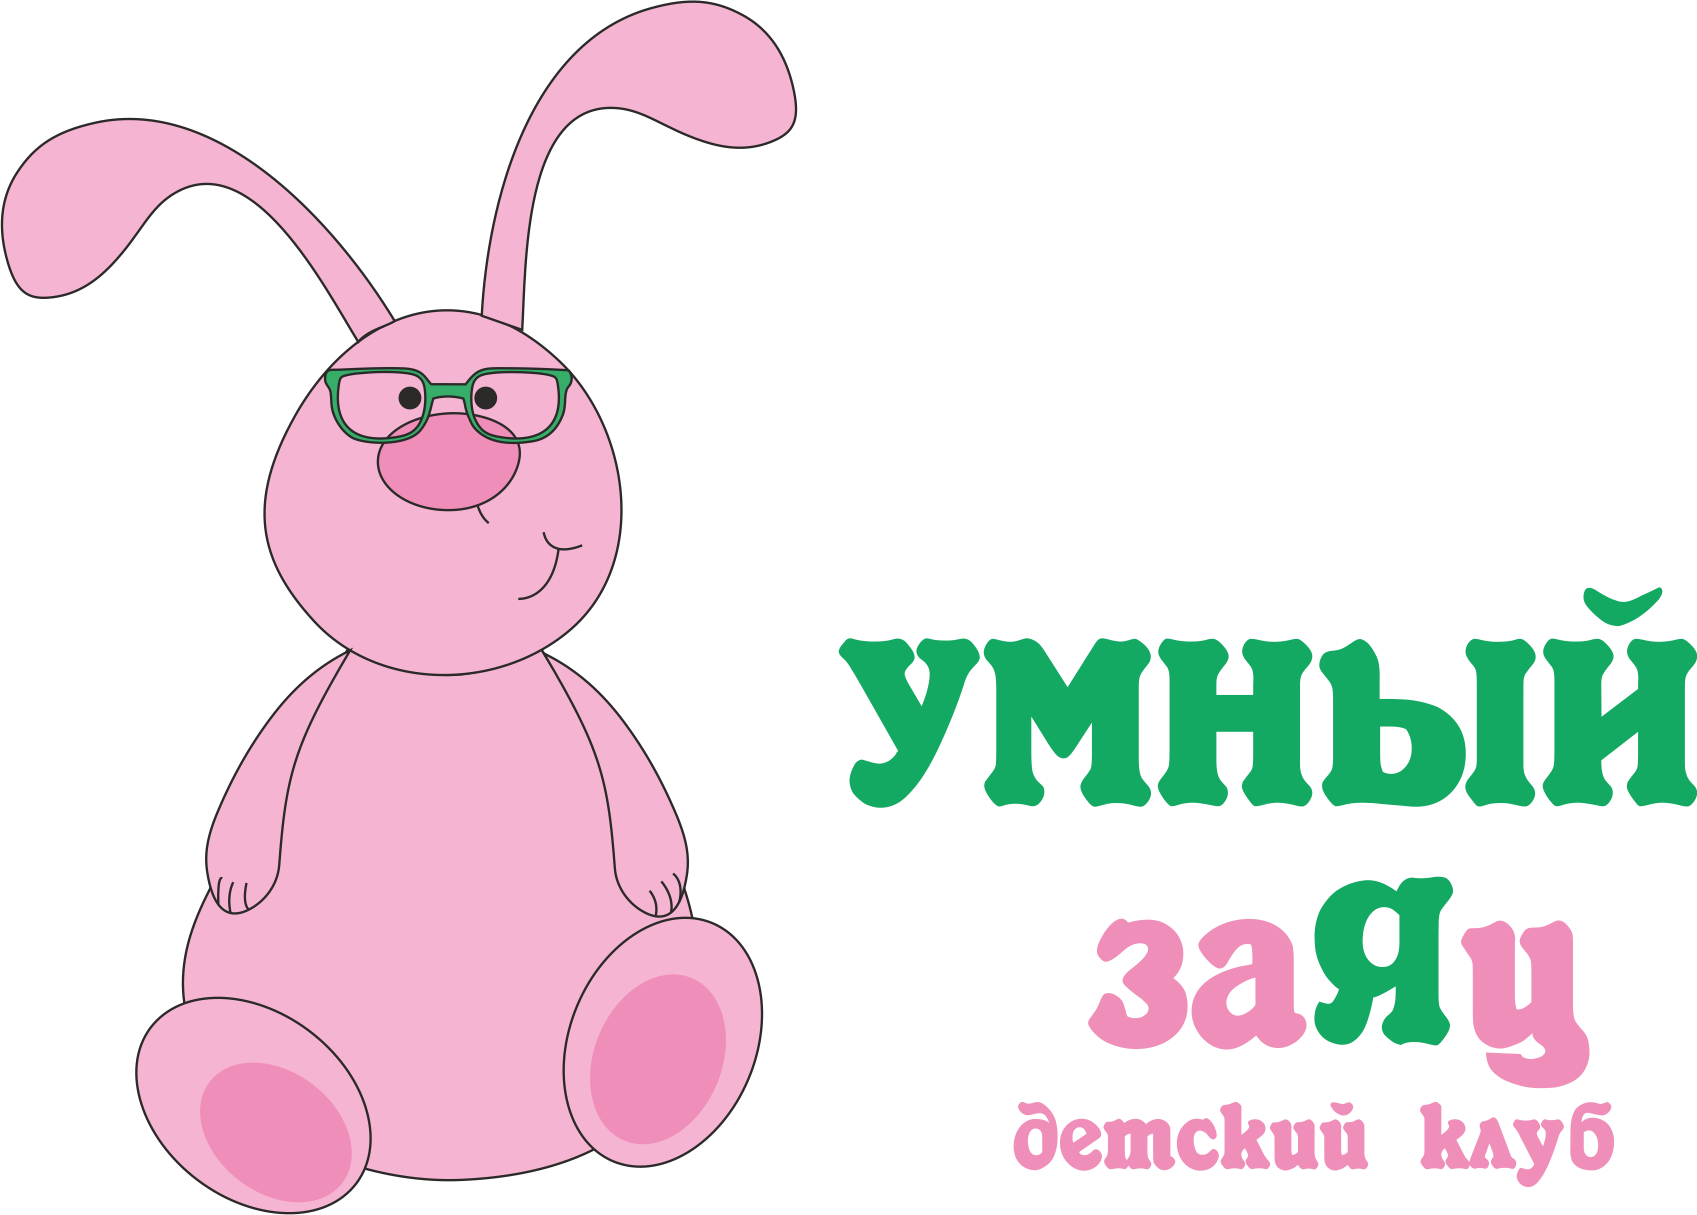 Разработать логотип и фирменный стиль детского клуба фото f_886555dafc9b1e0a.png